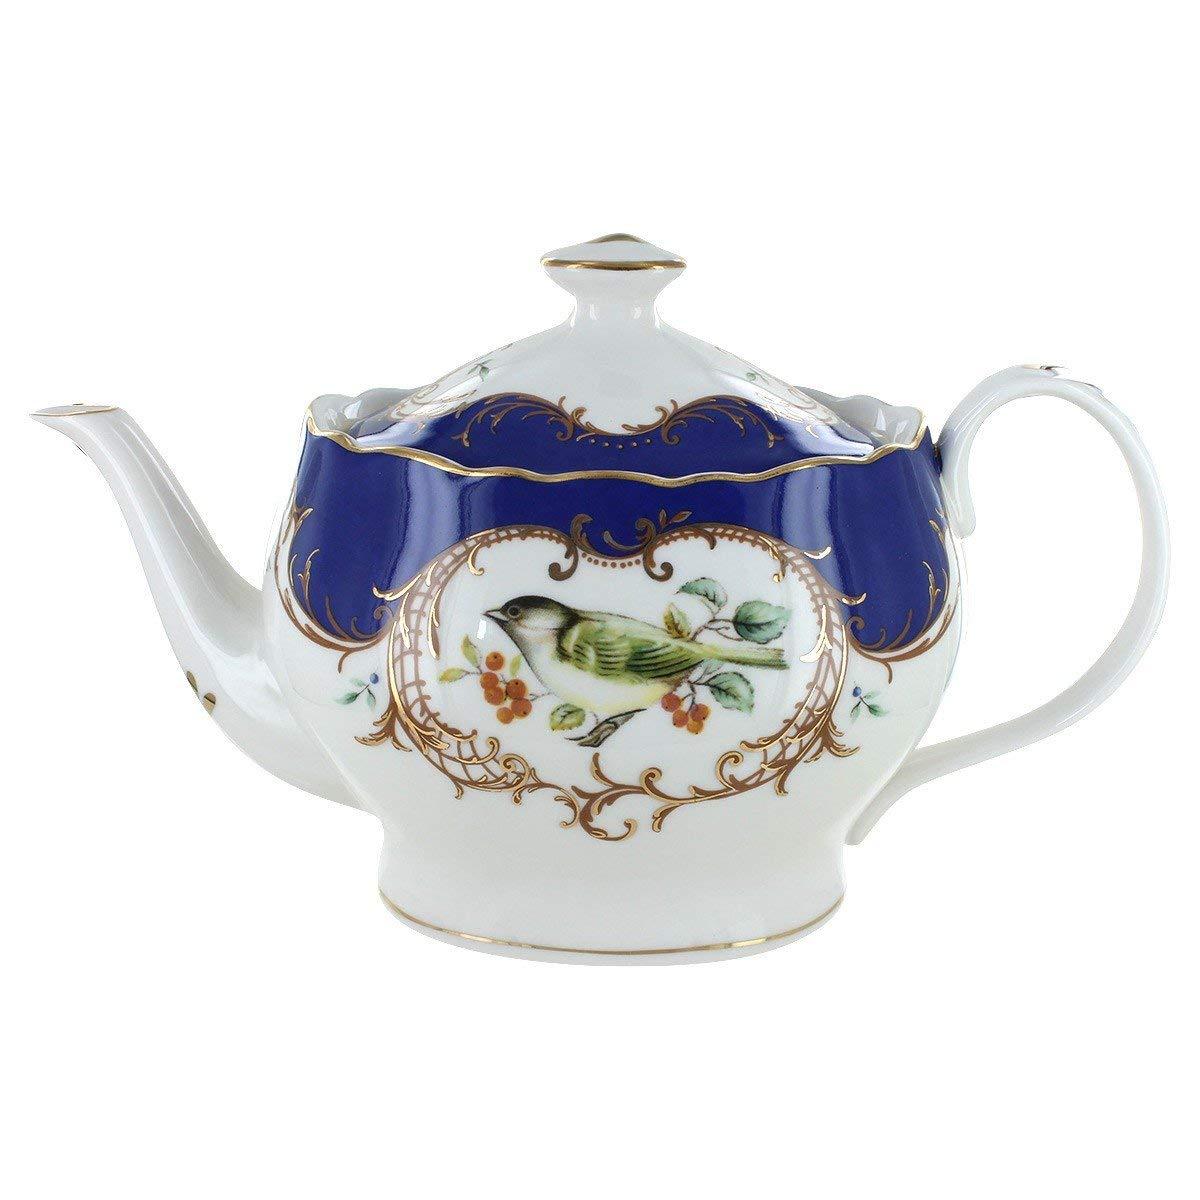 Royal Blue Bird Porcelain - 5 Cup Teapot